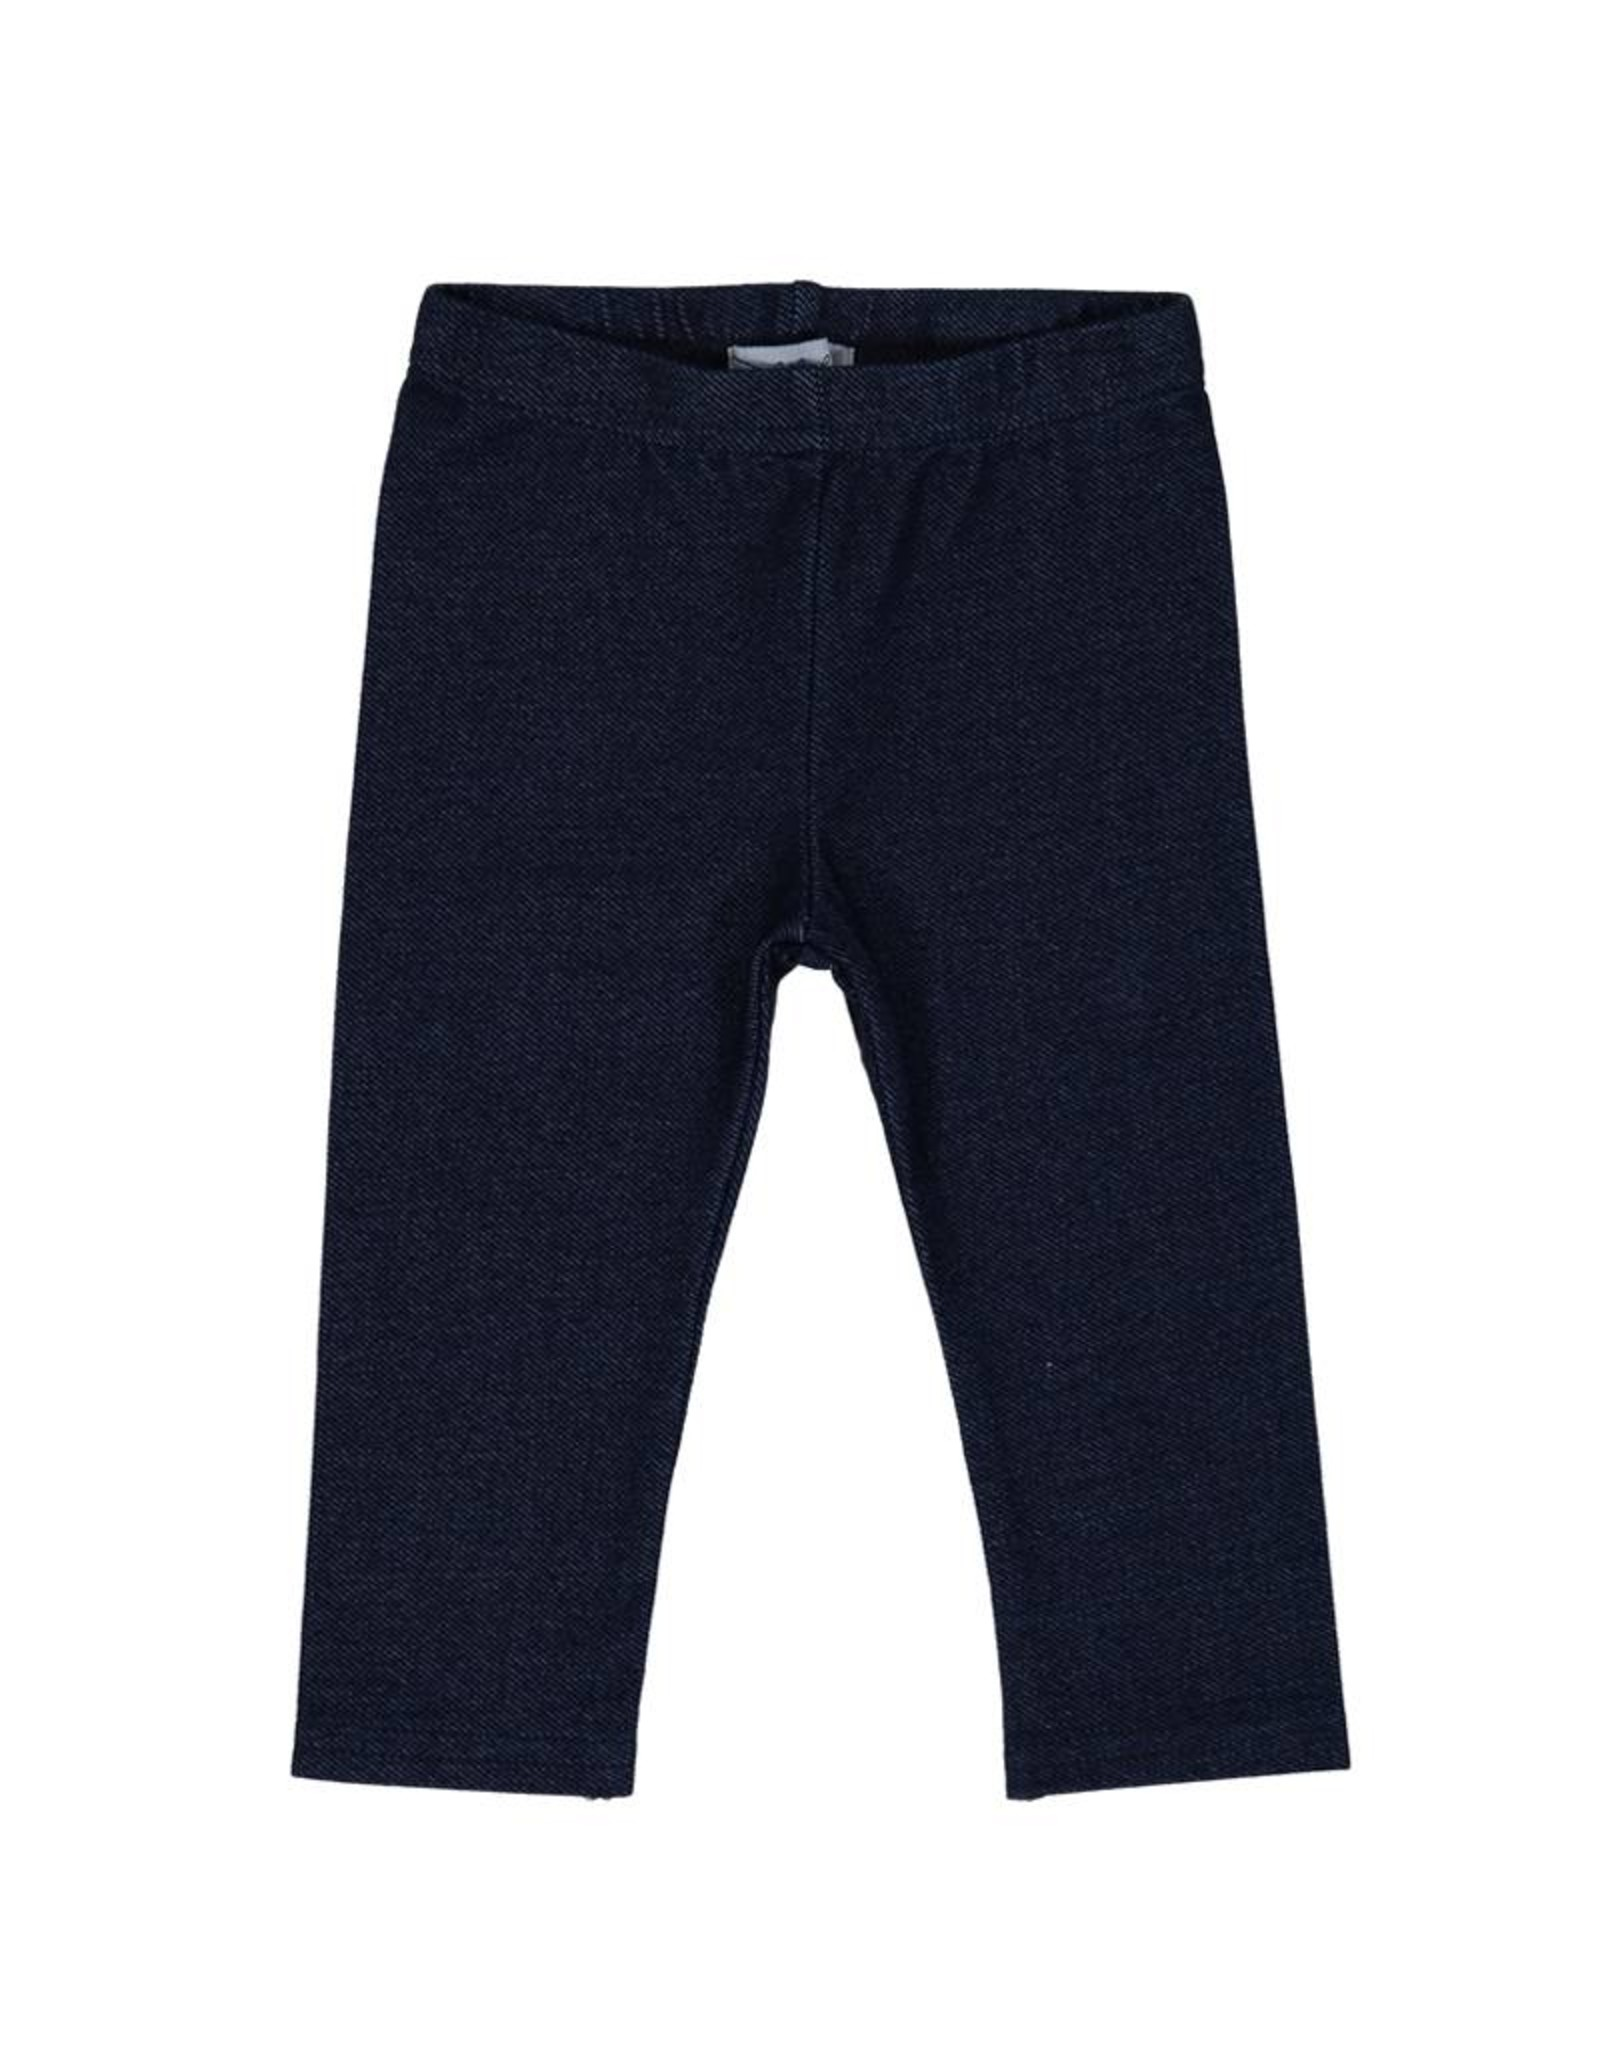 LIL LEGS Spring/Summer Jean Leggings